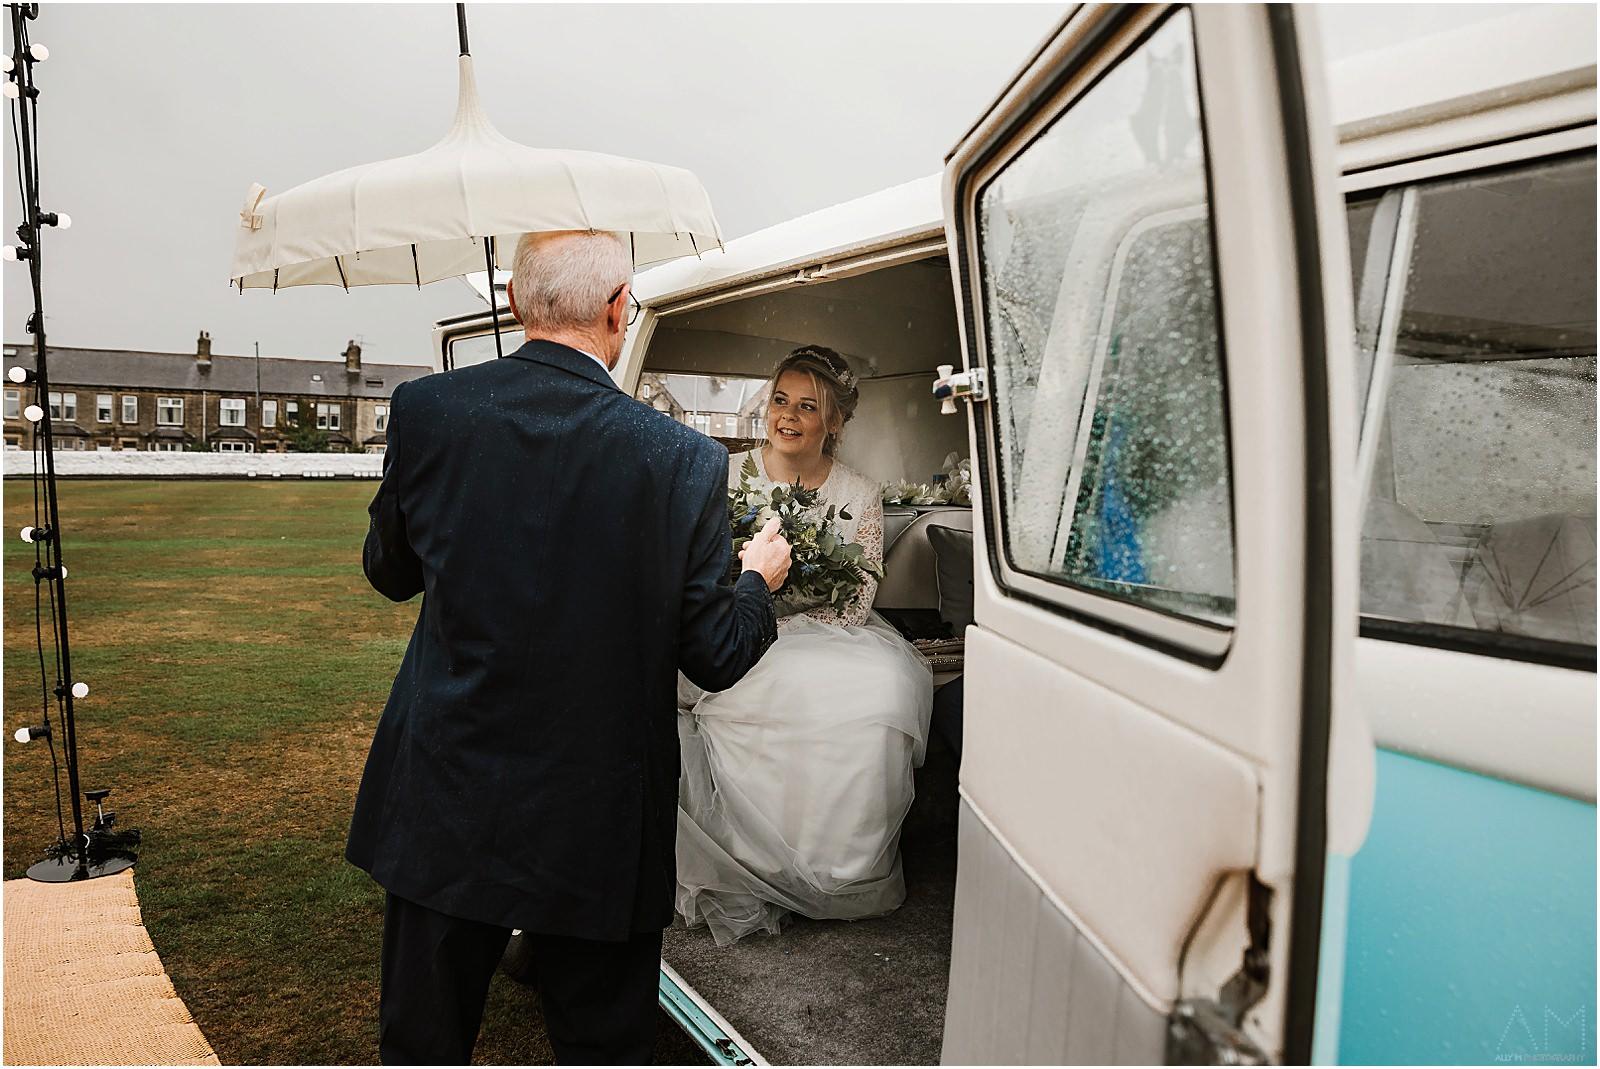 Bride arriving at wedding in campervan